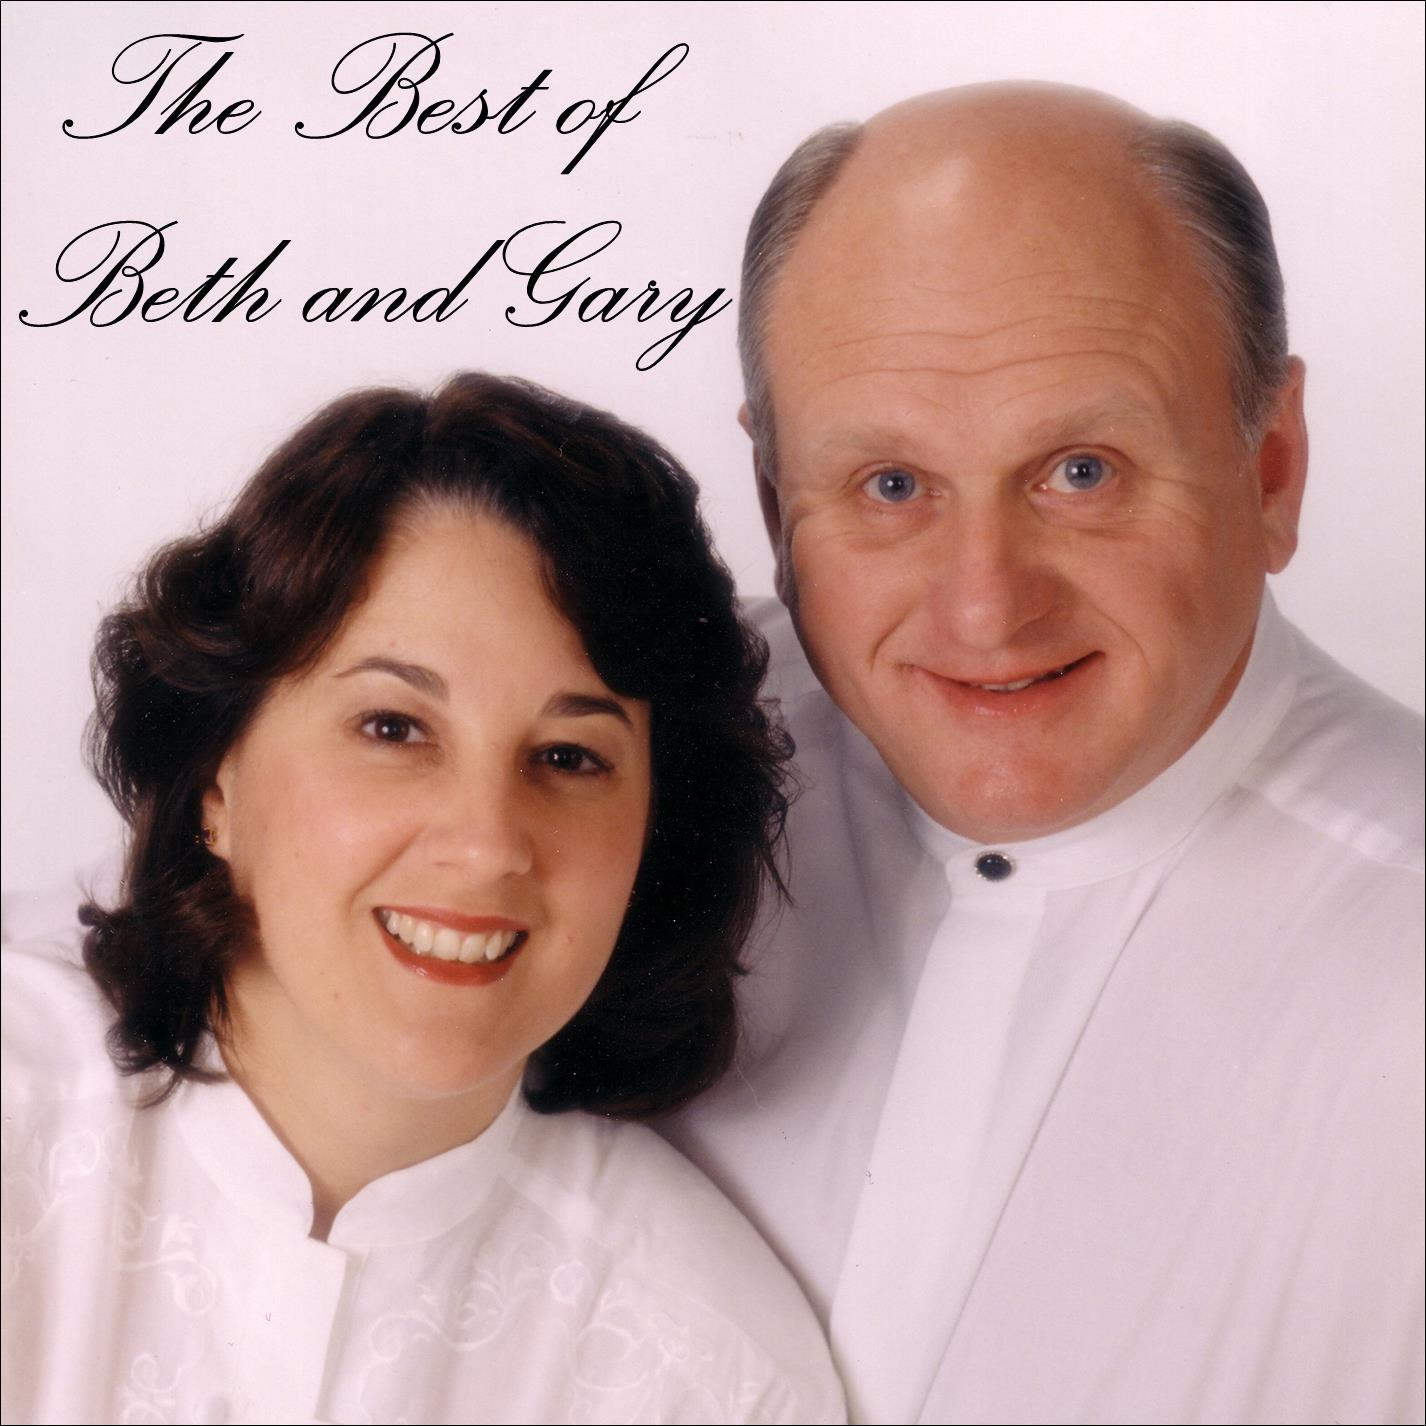 Beth-and-Gary.jpg